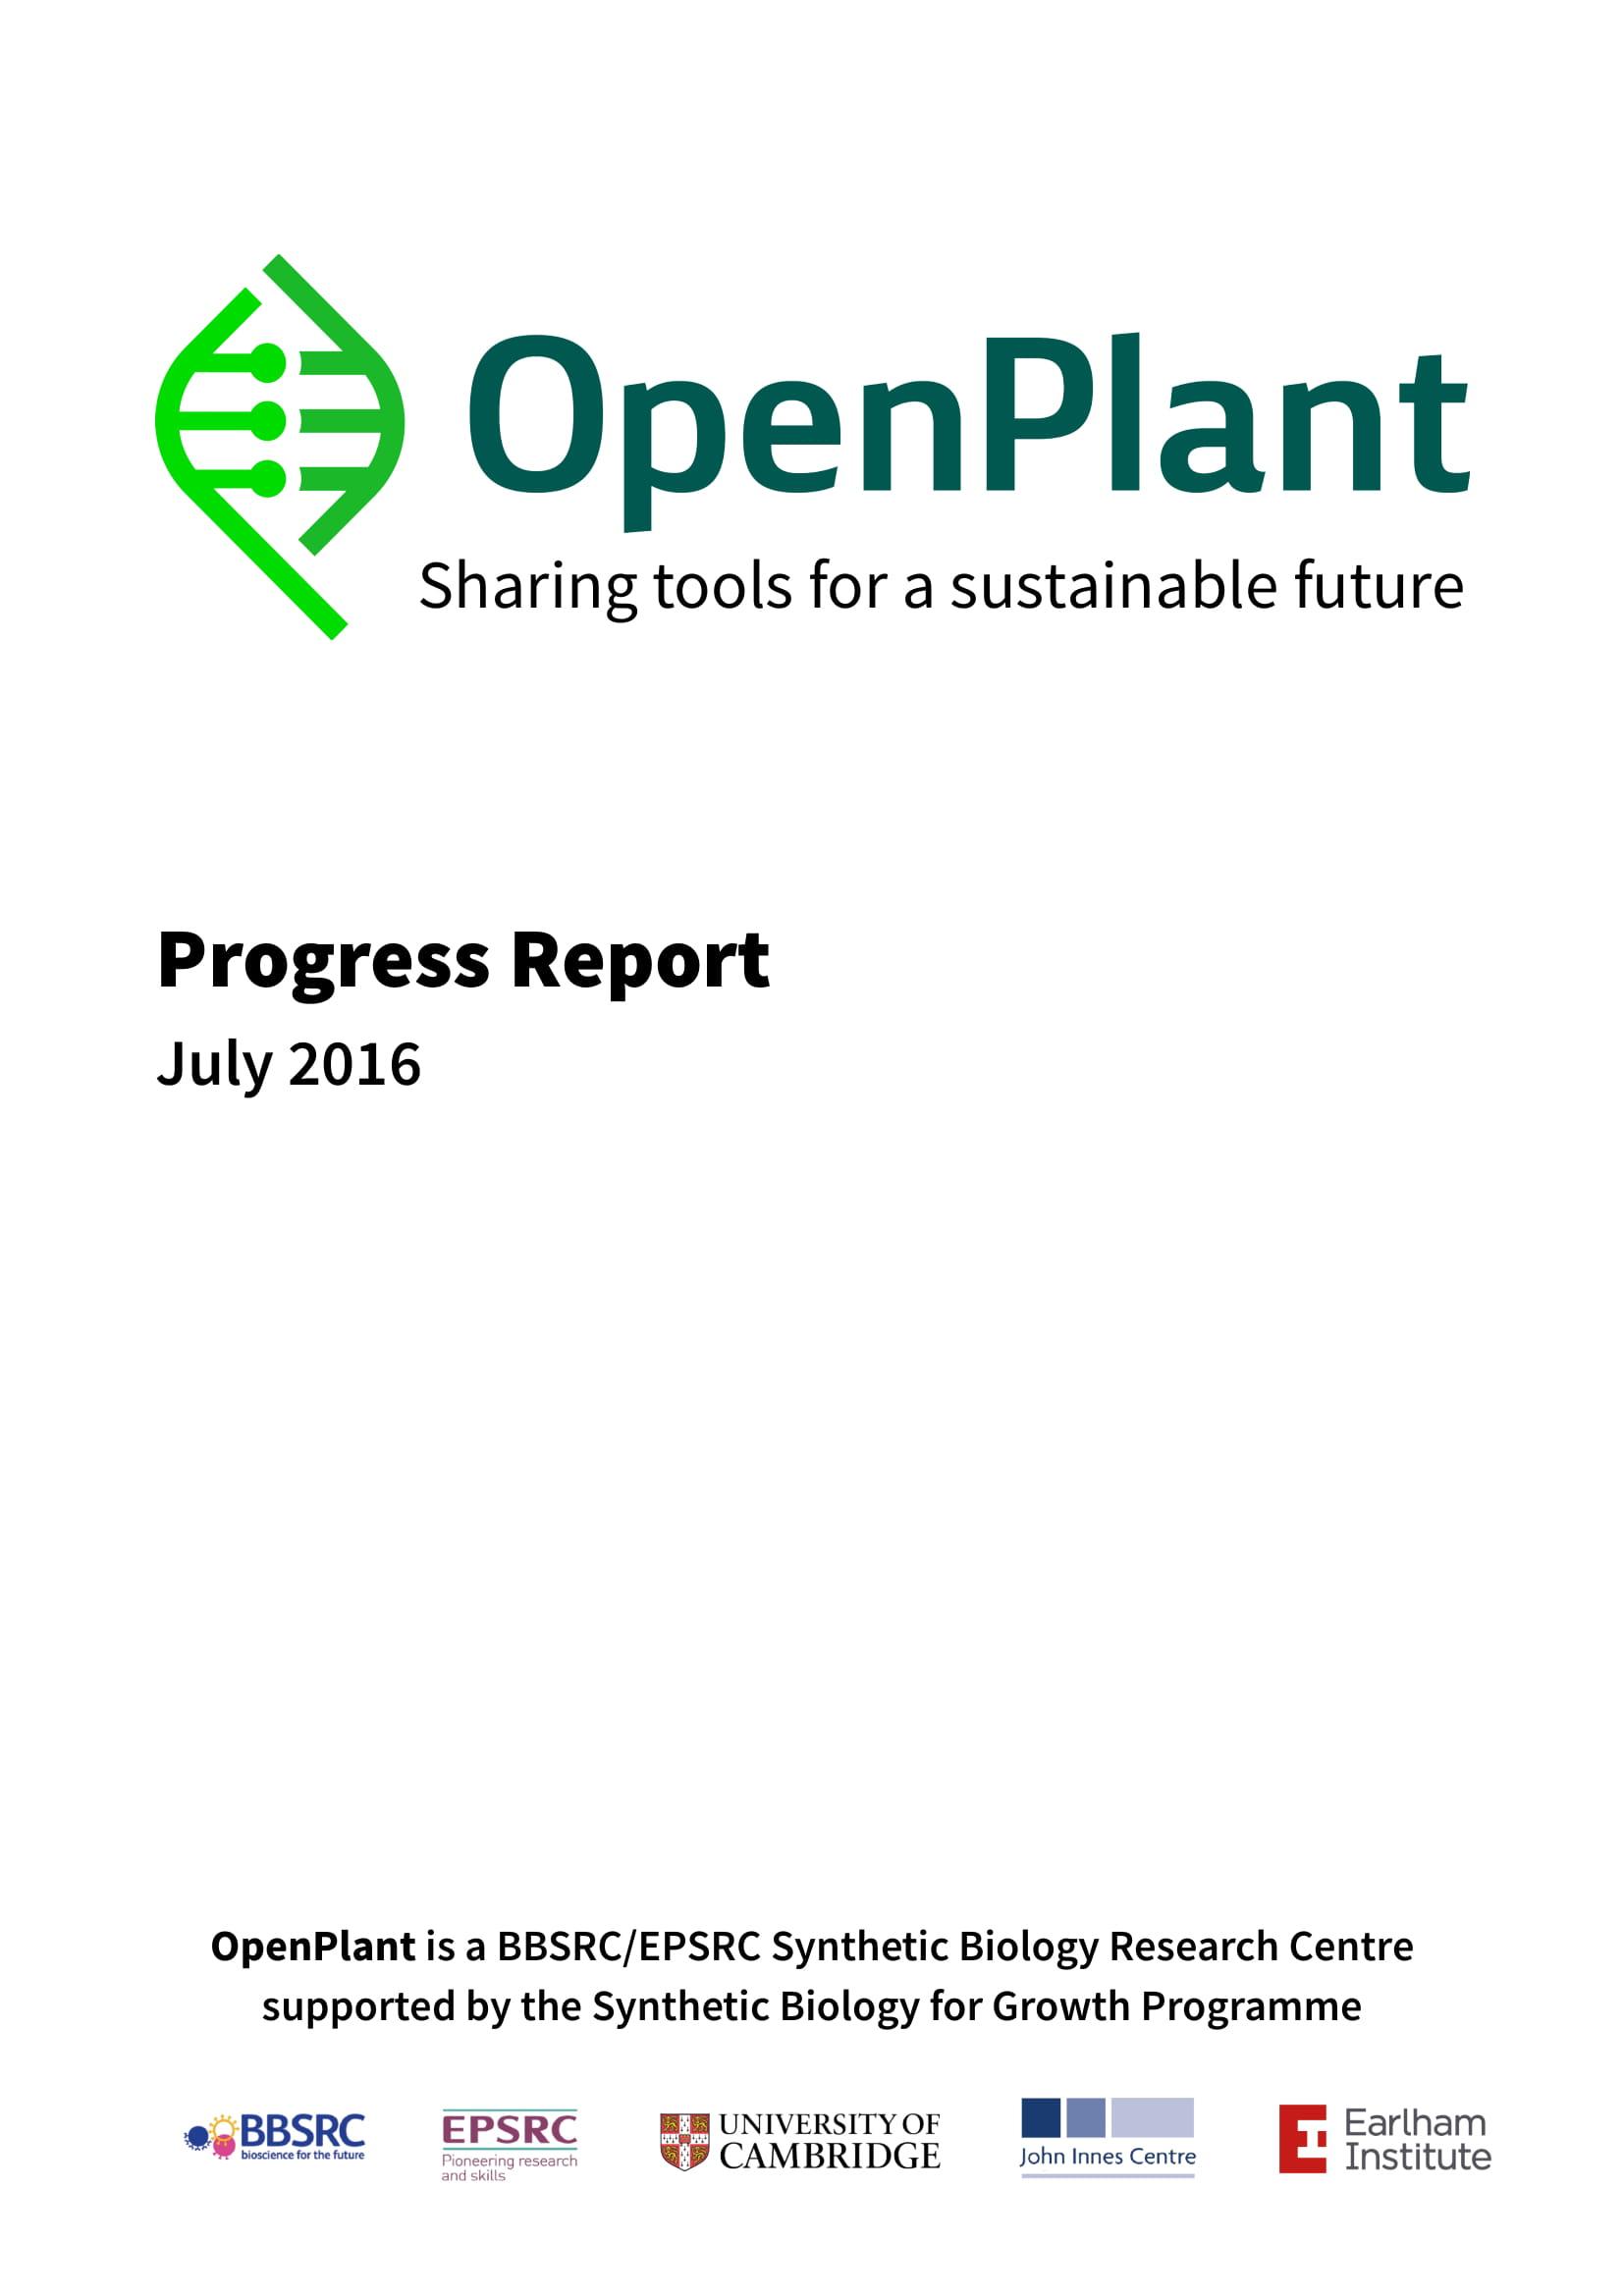 Progress Report 2016